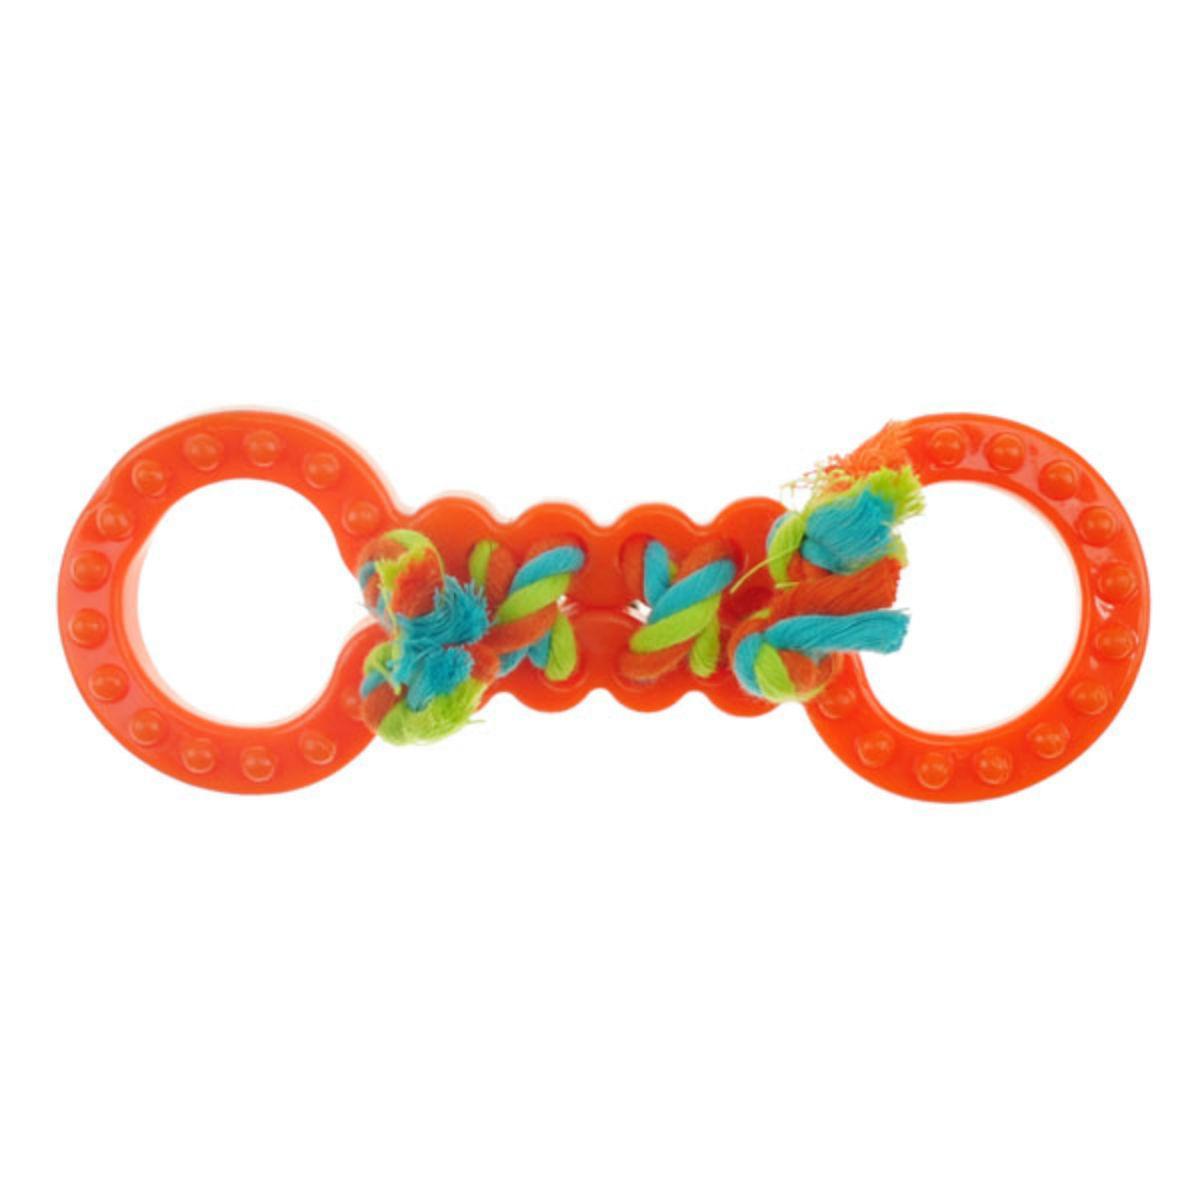 Chomper Mini TPR Figure 8's with Rope Dog Toy - Orange